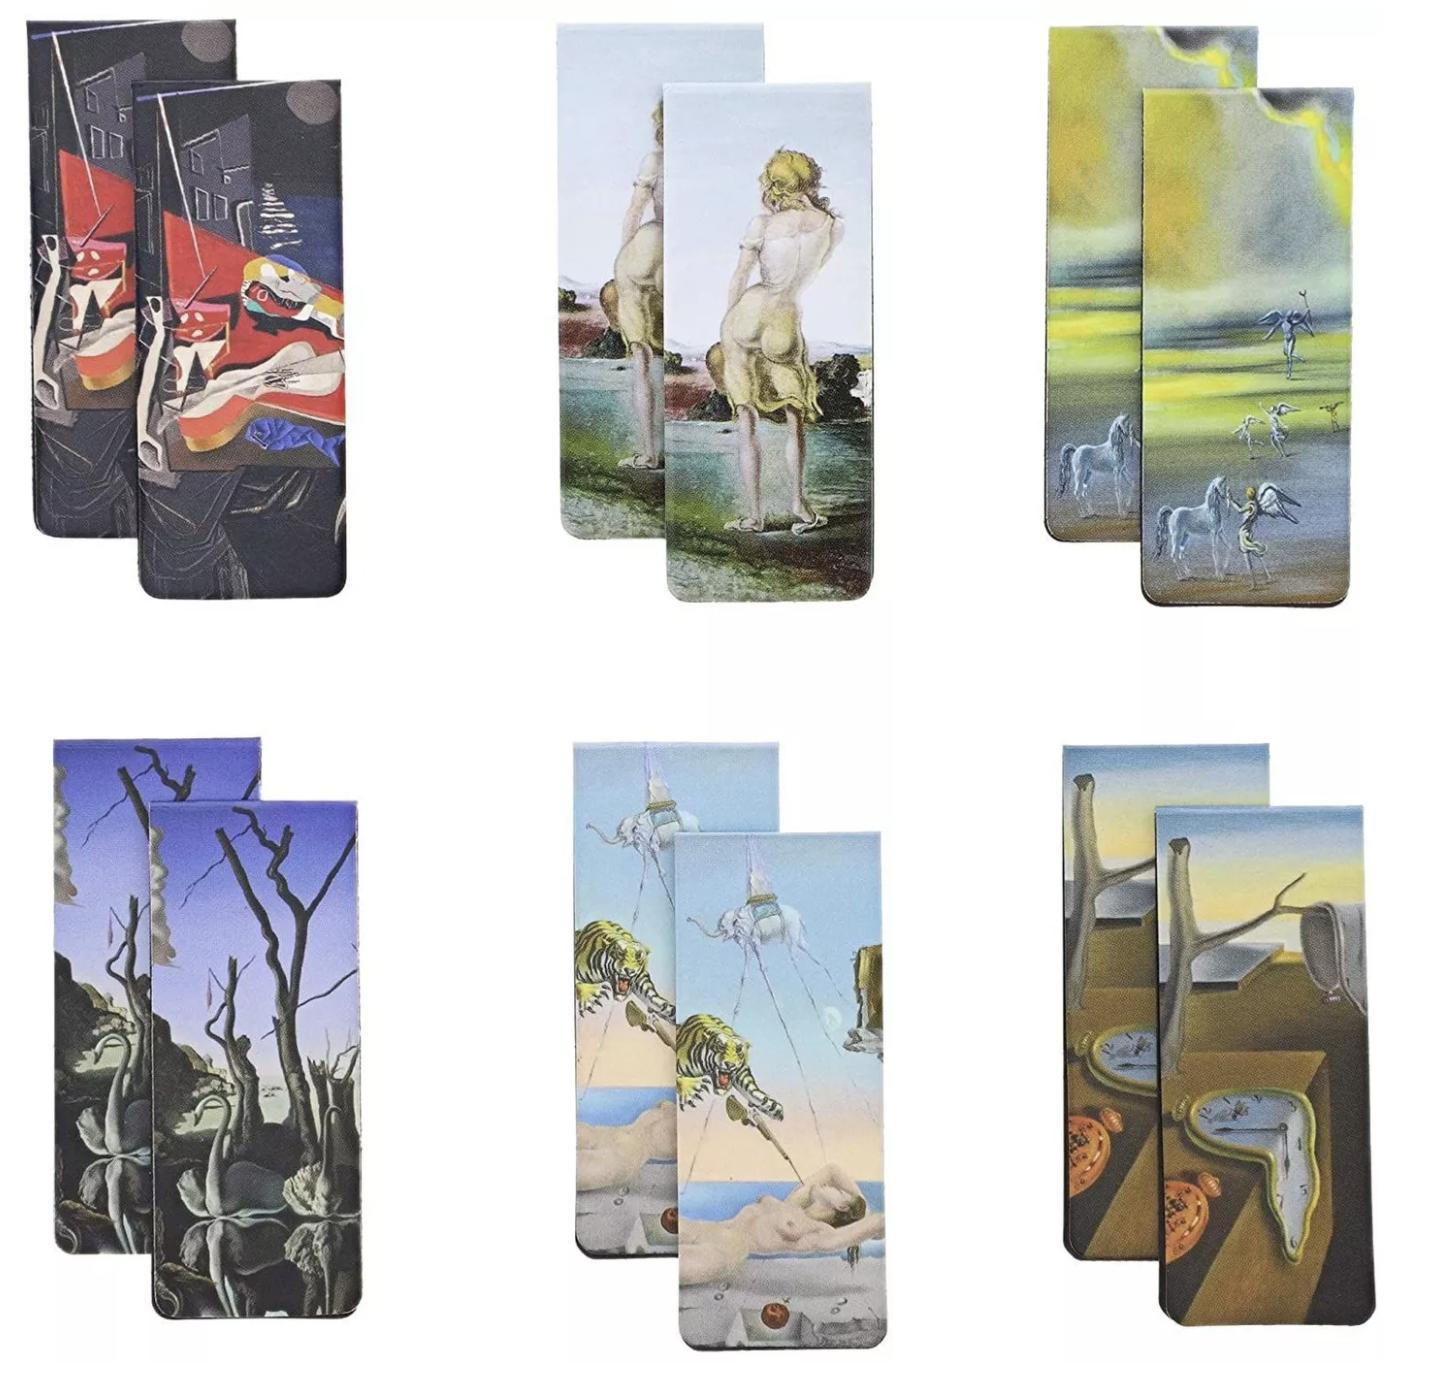 12-Pack Dali Design Inspired Magnetic Bookmarks in 6 Designs